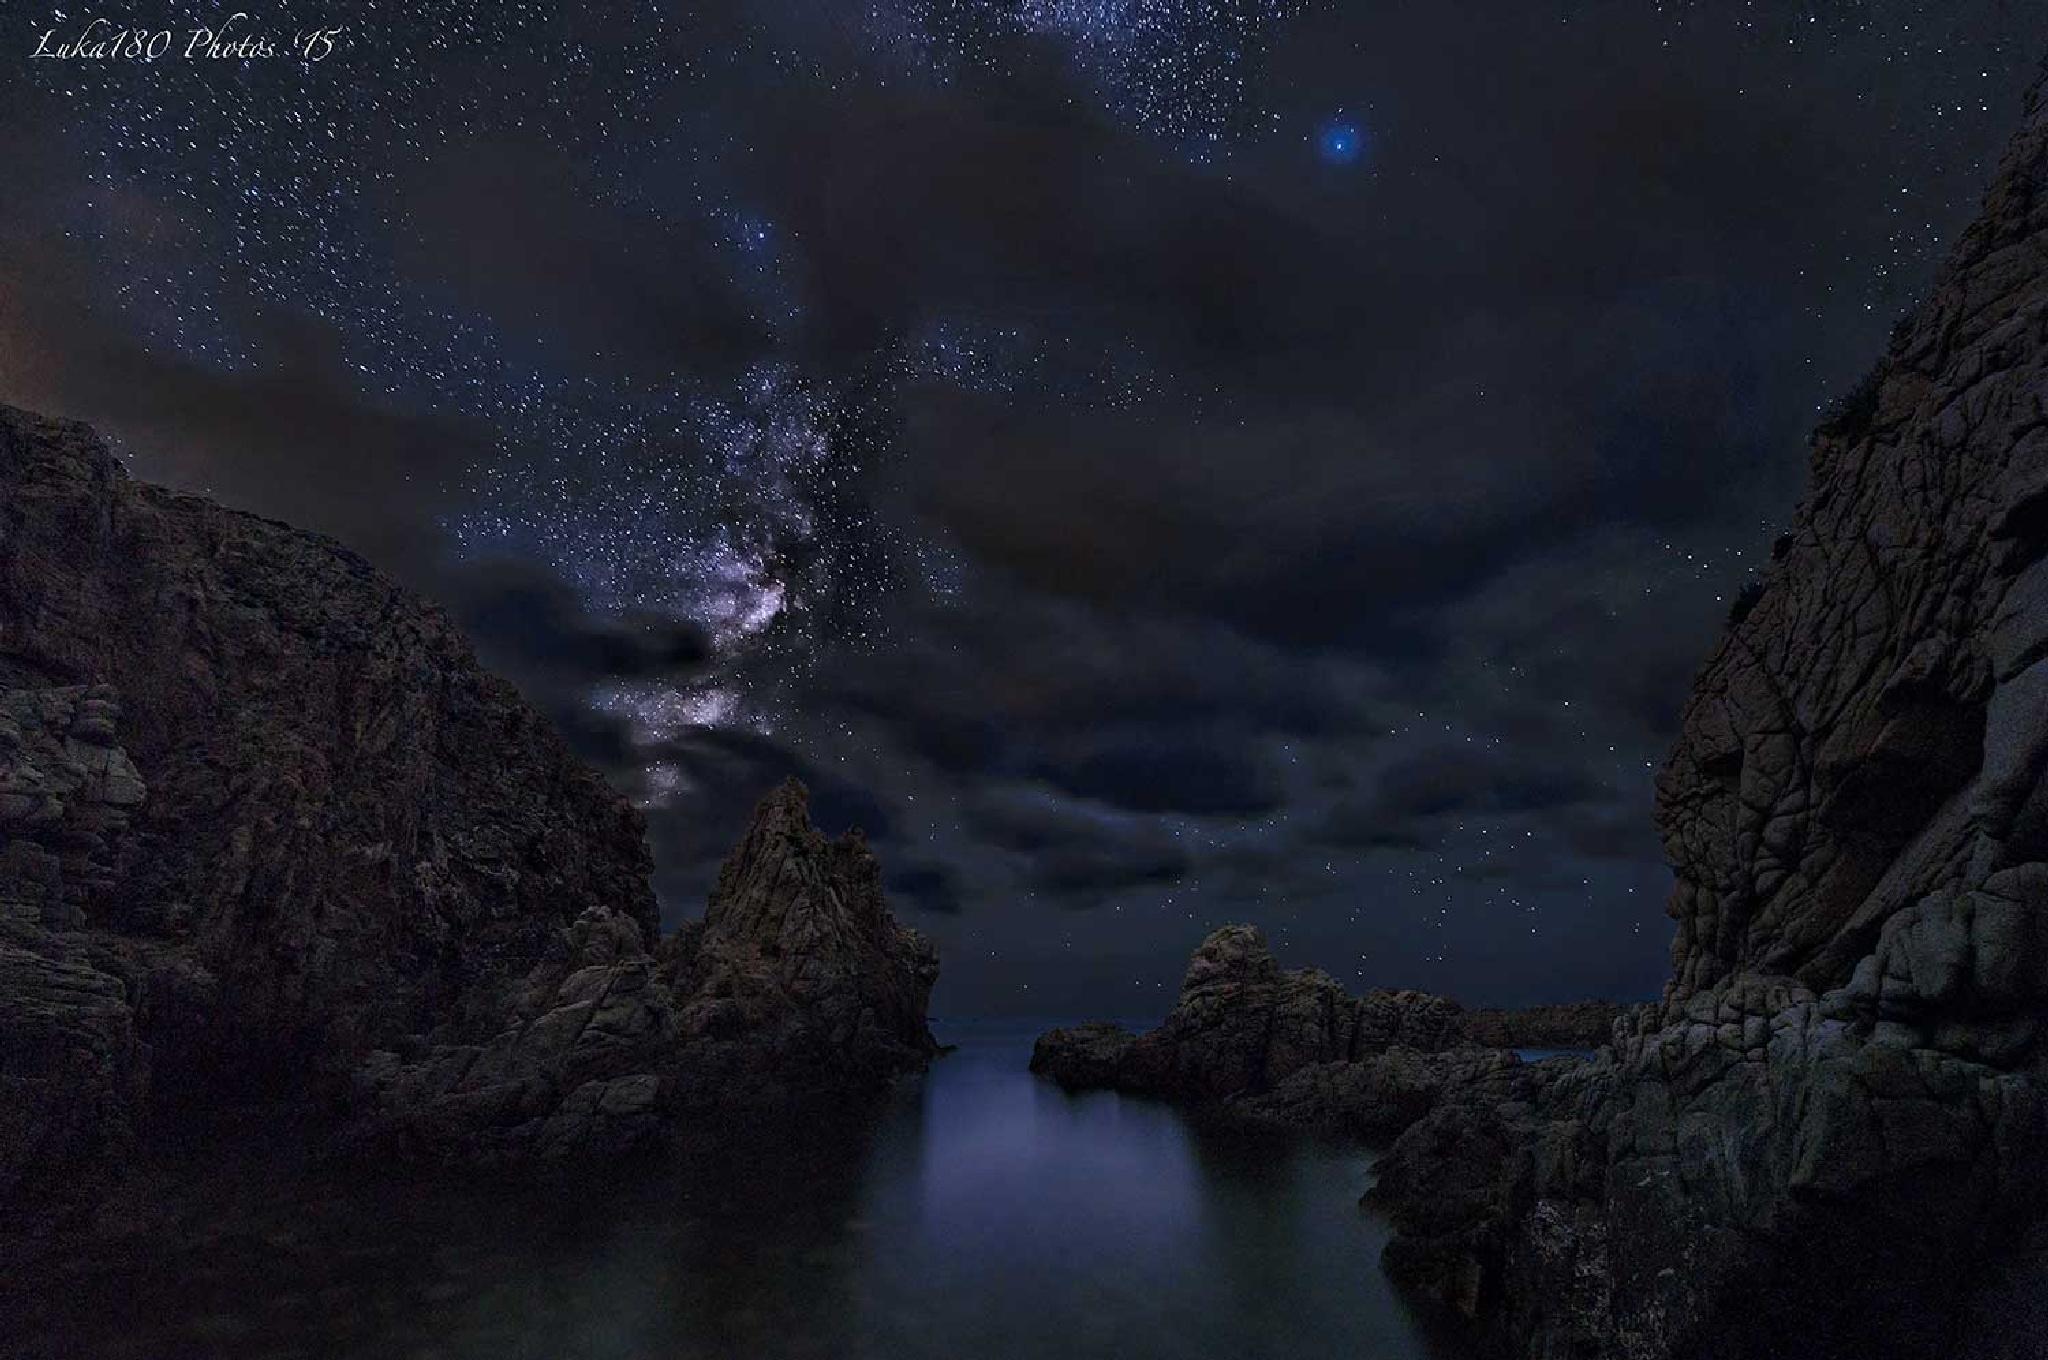 Capo Pecora MilkyWay by Luca Sanna